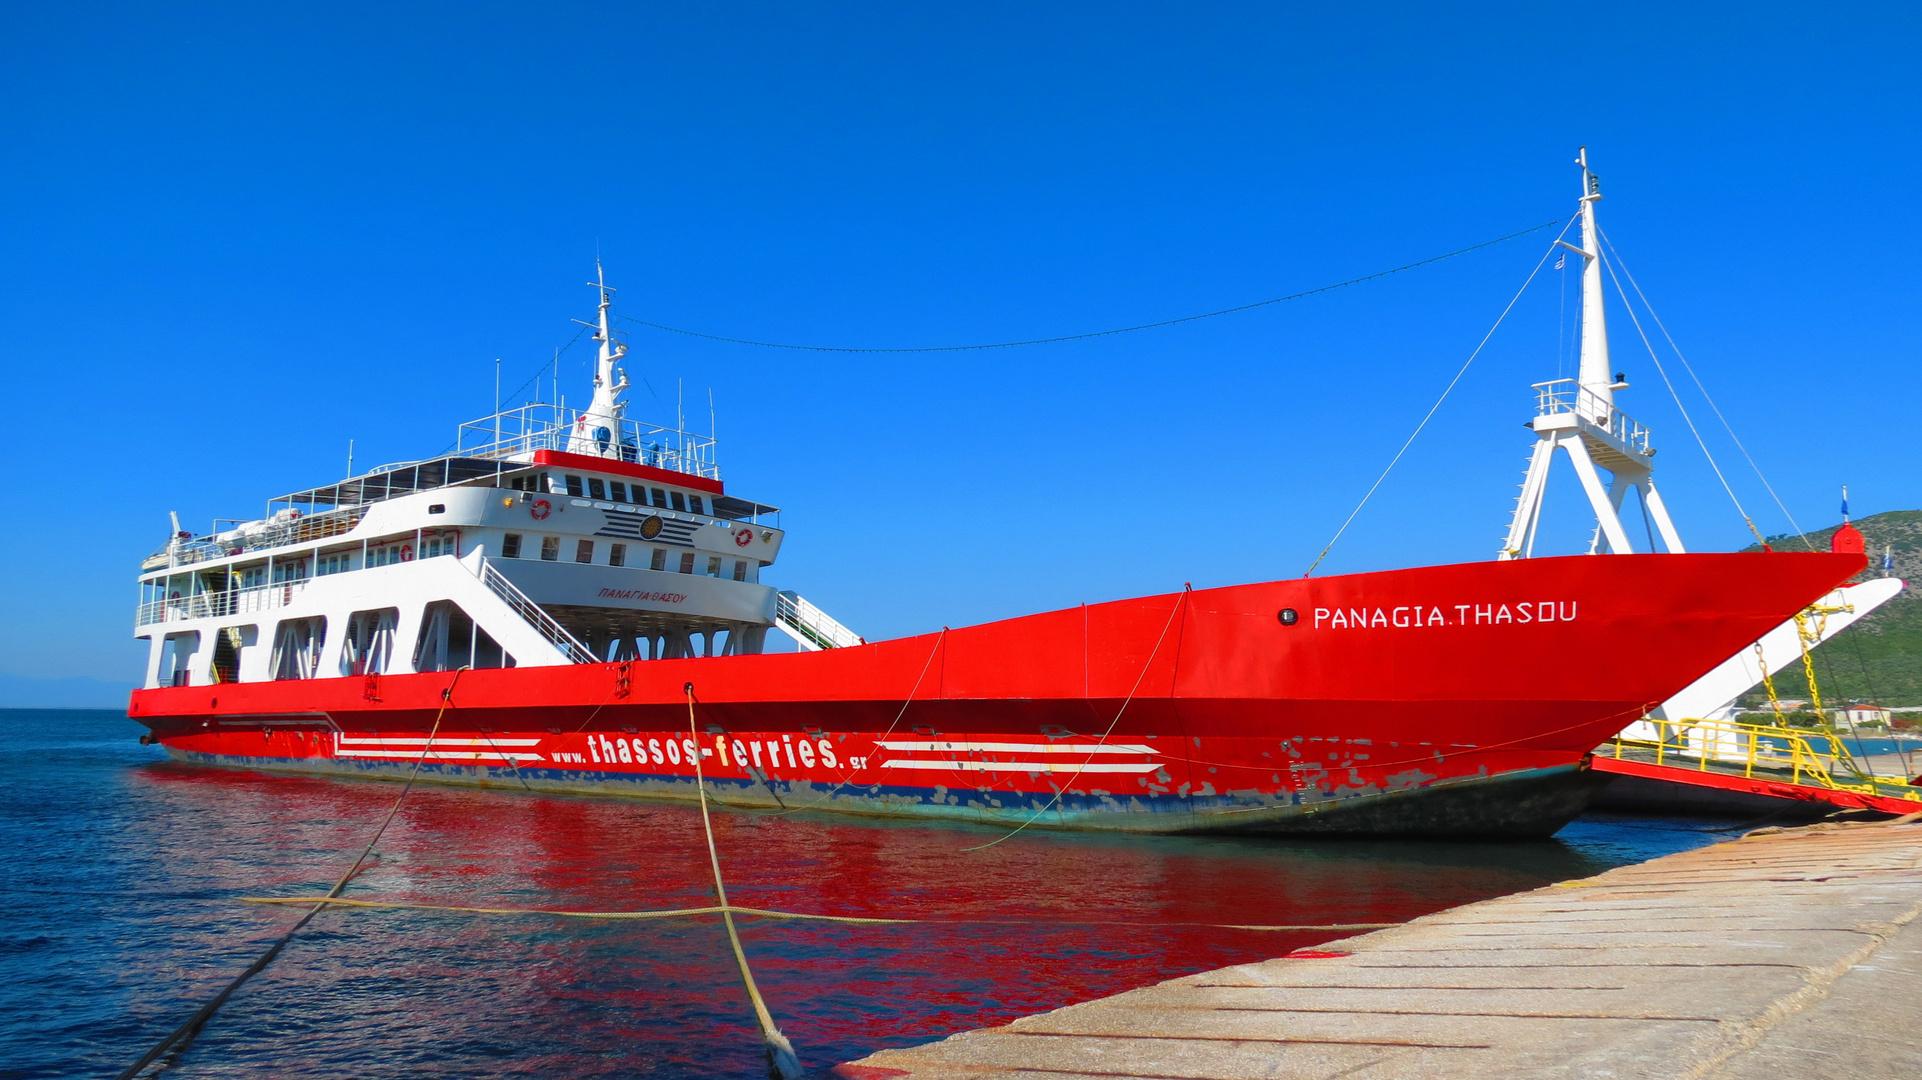 bateau rouge